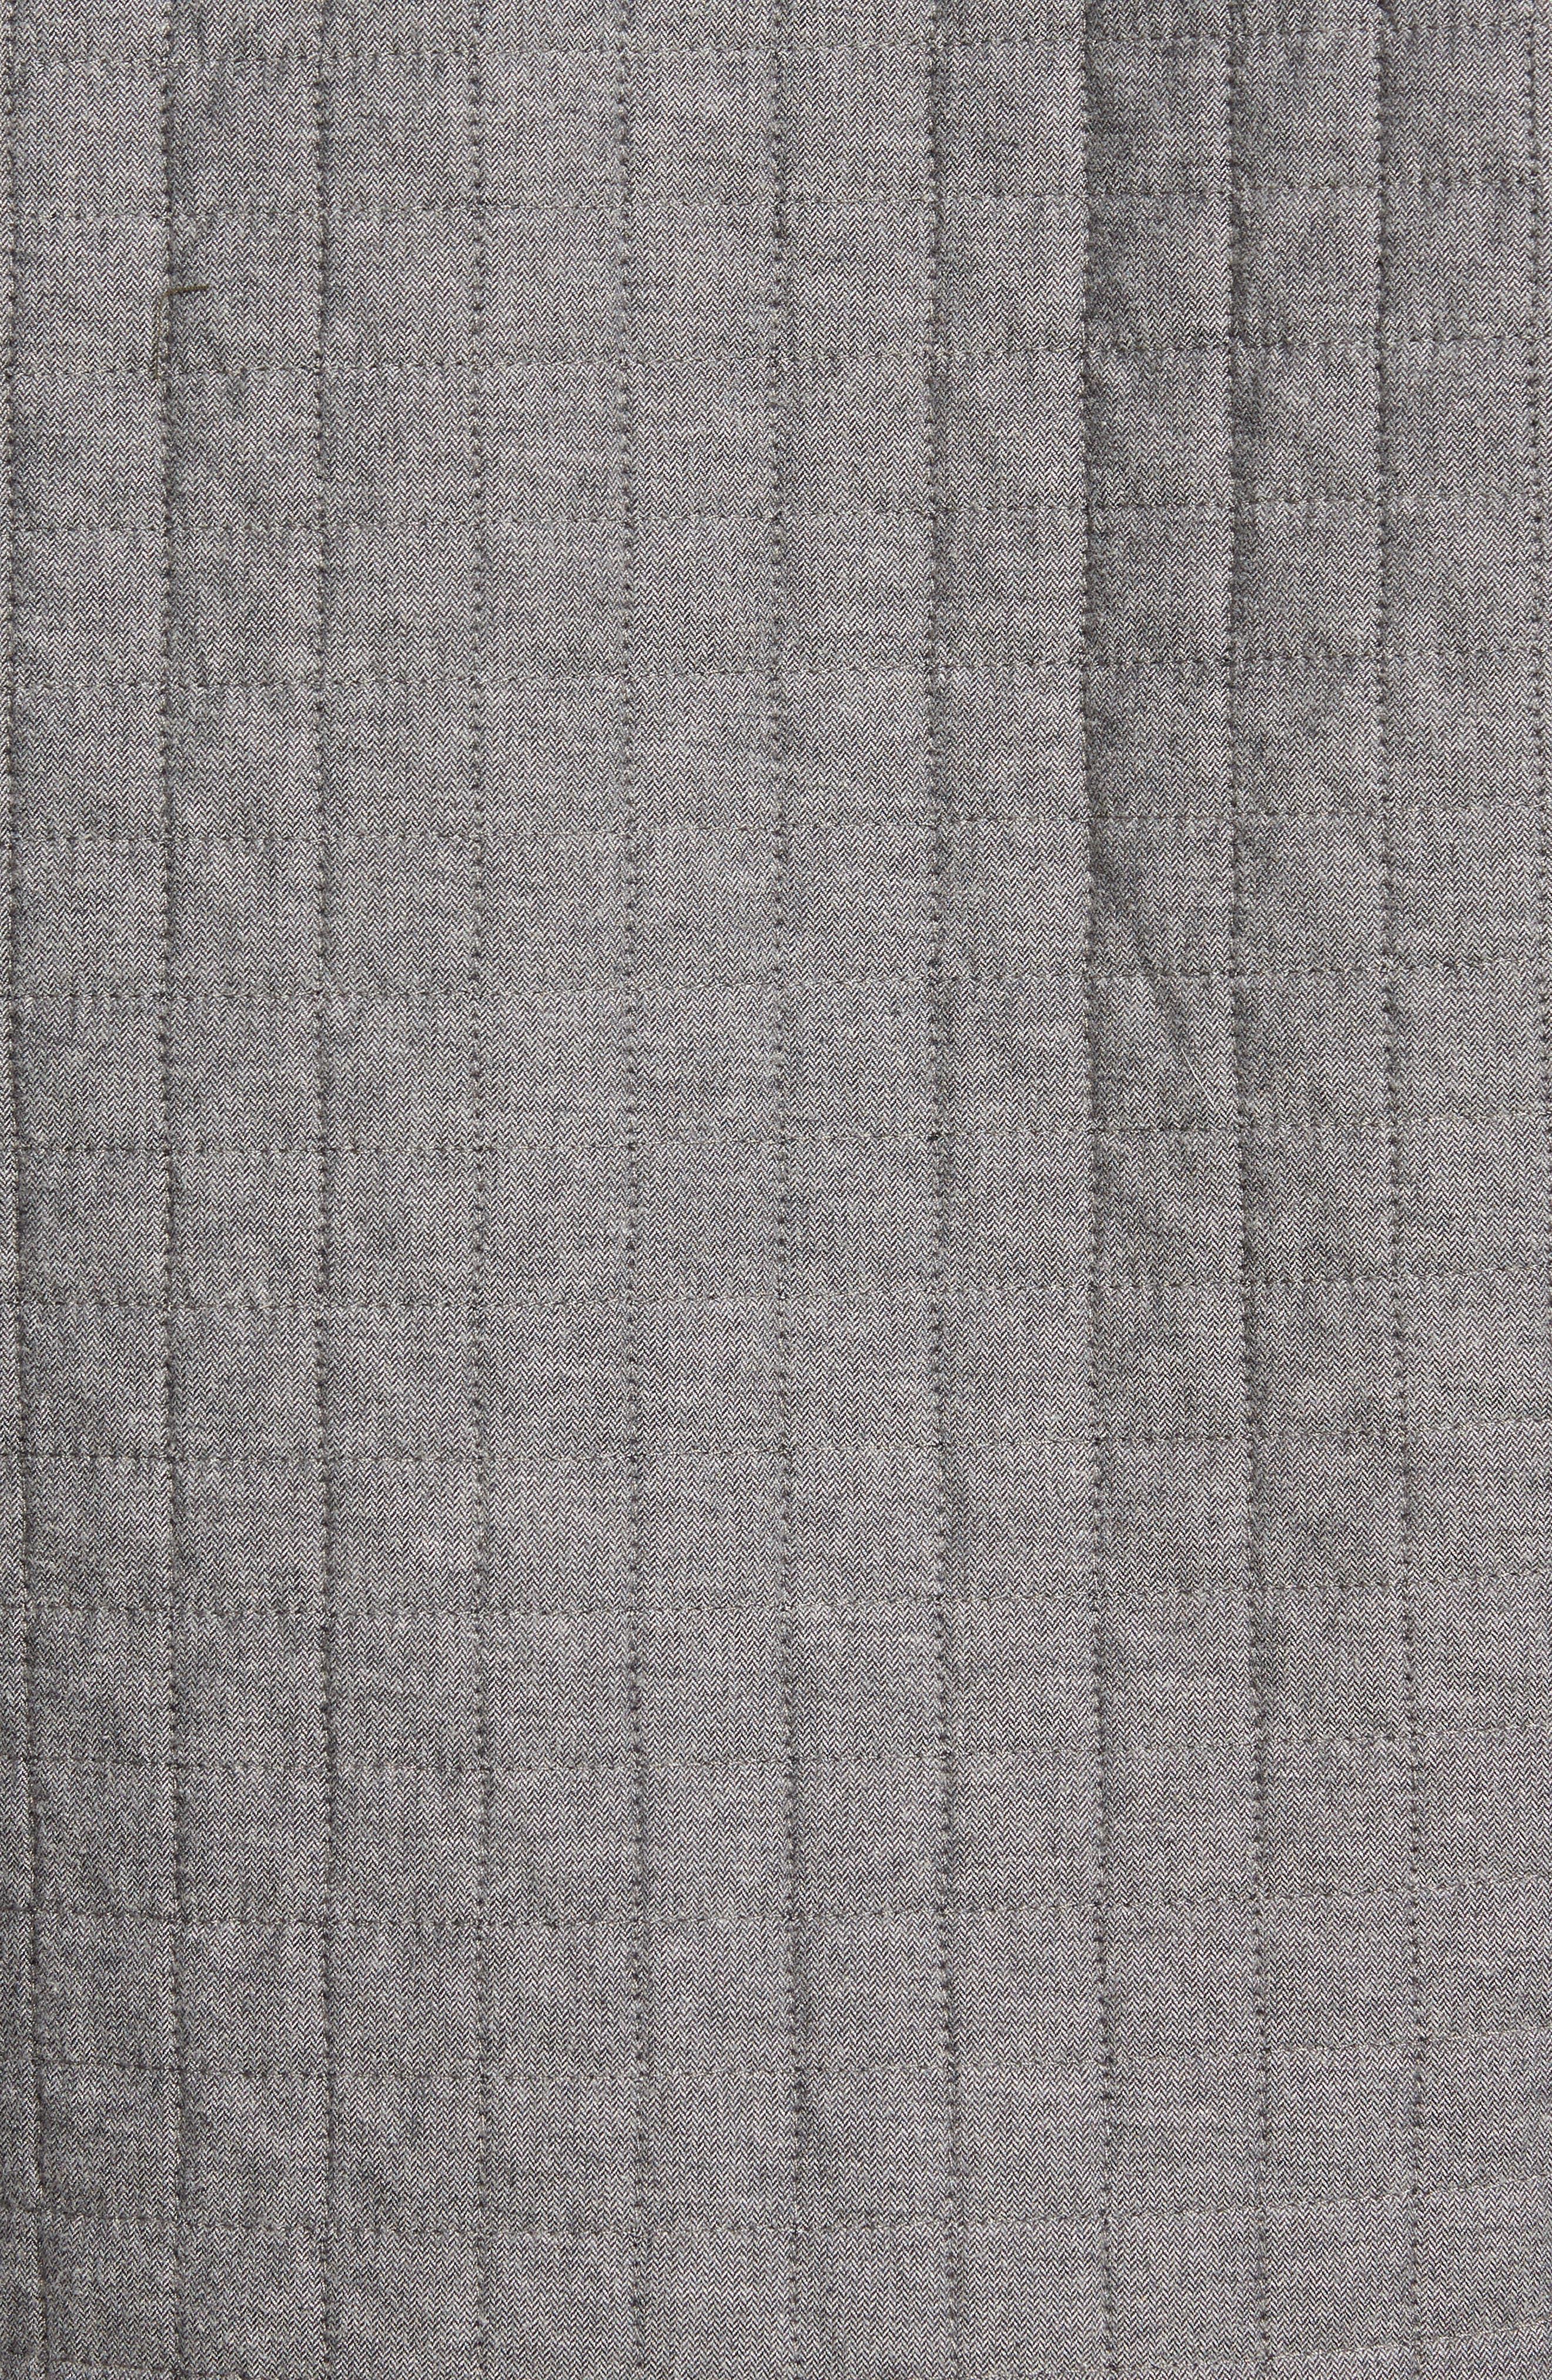 Gunstock River Lightweight Quilted Shirt Jacket,                             Alternate thumbnail 6, color,                             001